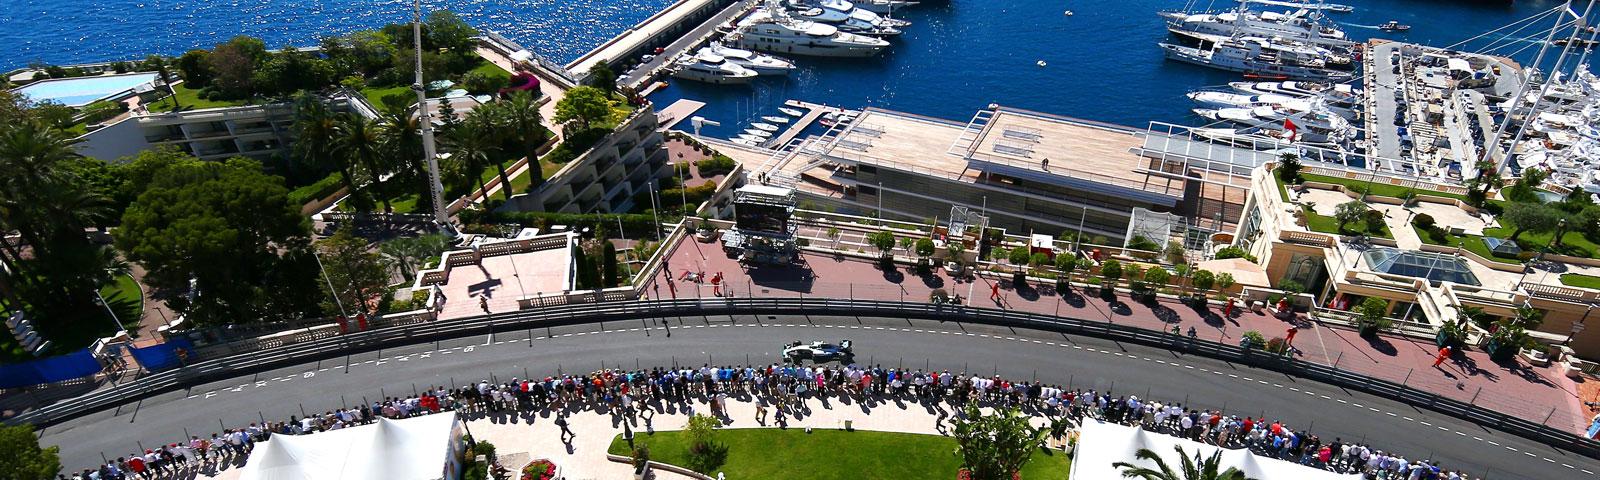 Home-Page-Monaco-GP.jpg